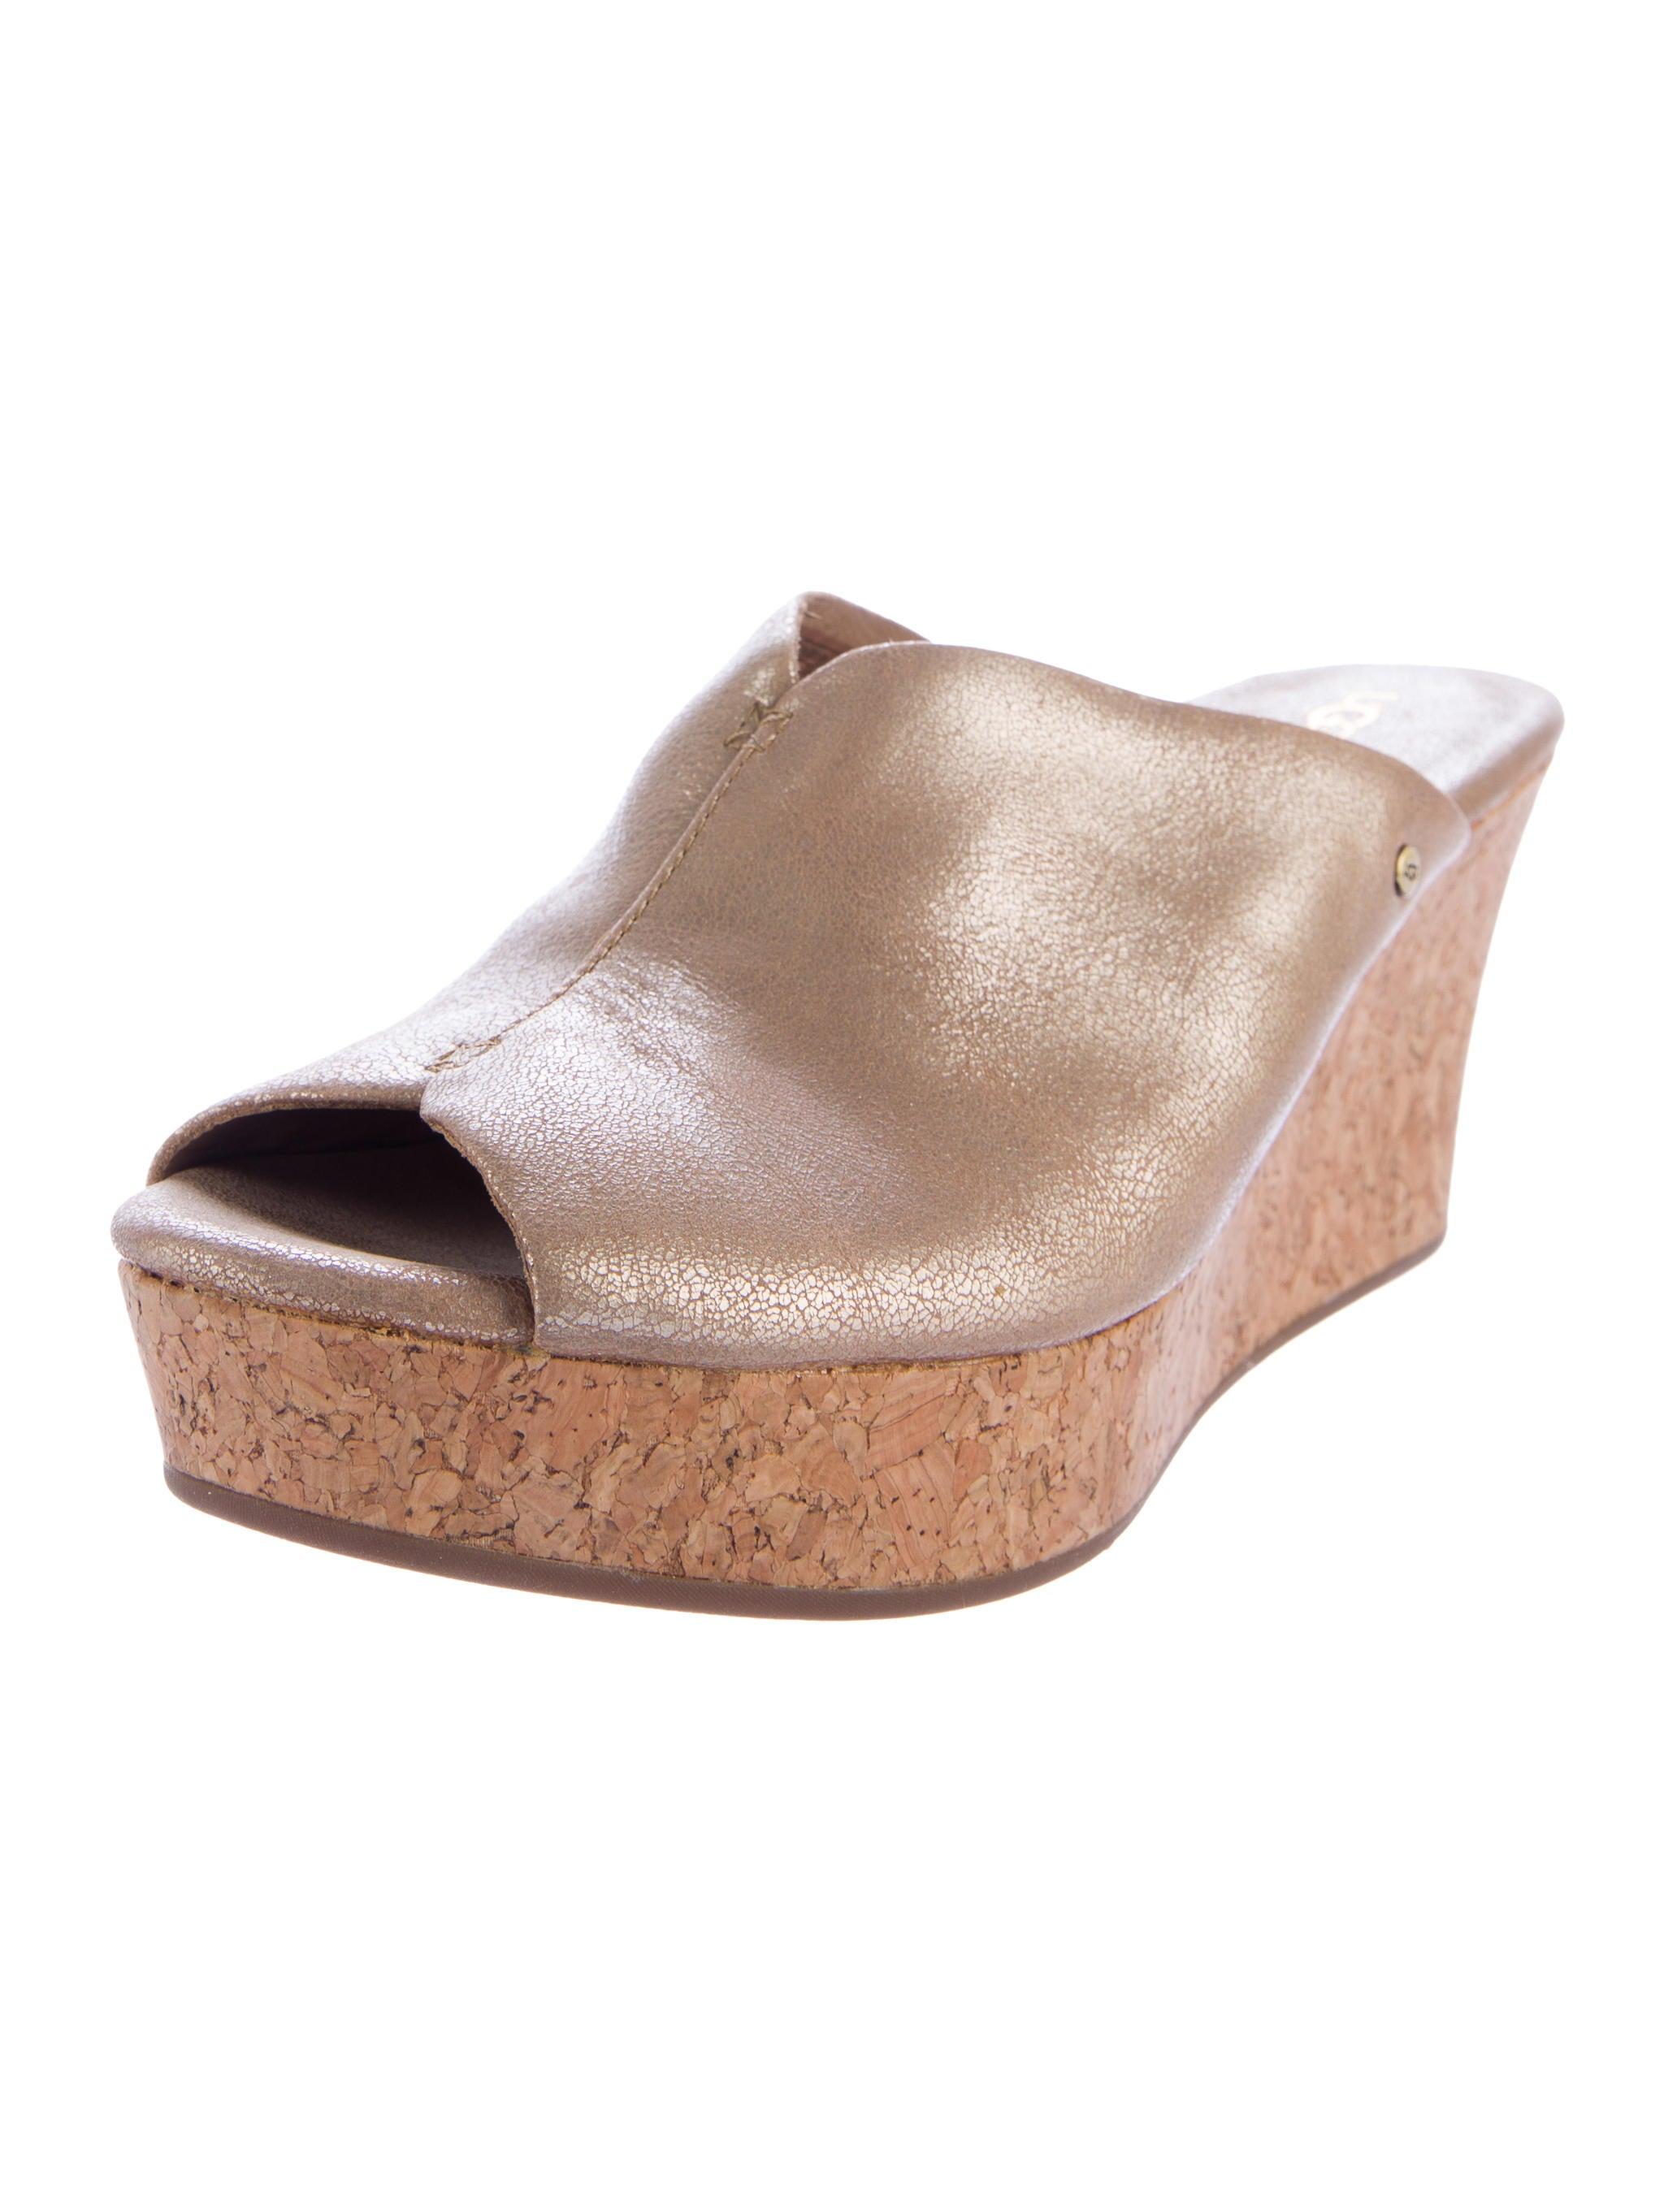 ugg australia dominique wedge sandals shoes wuugg21203